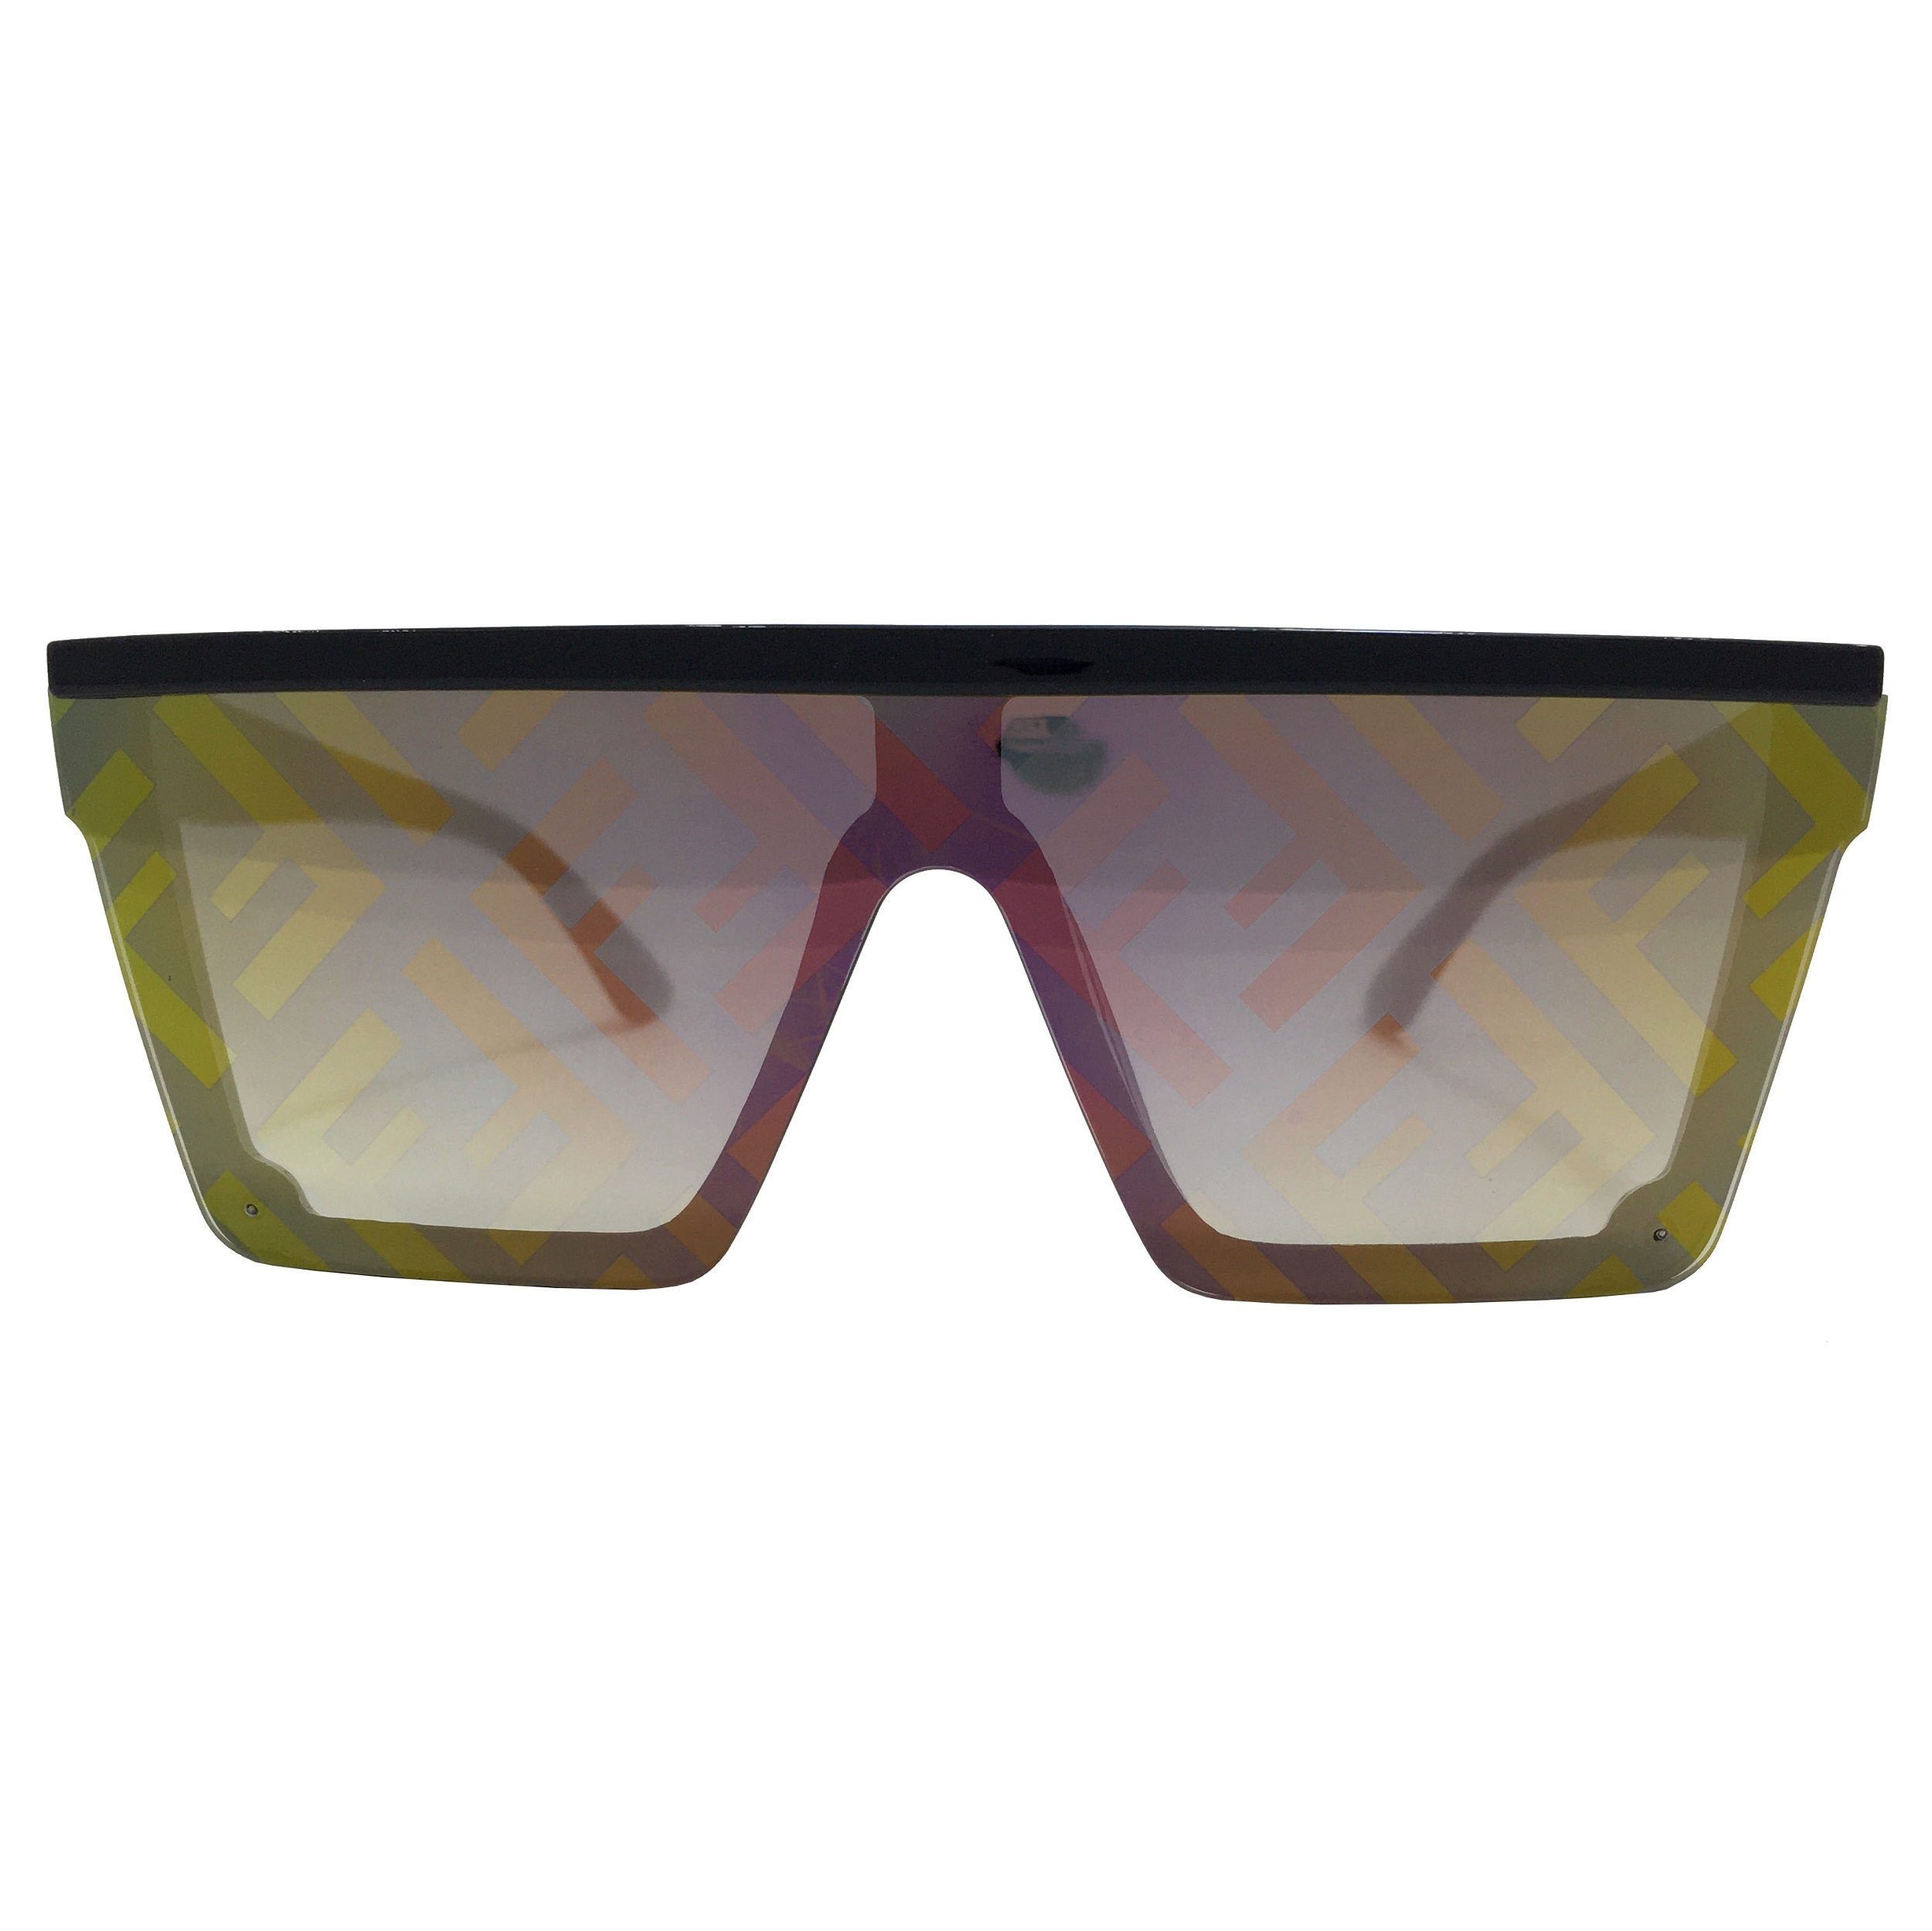 عینک آفتابی  مدل 335121                     غیر اصل